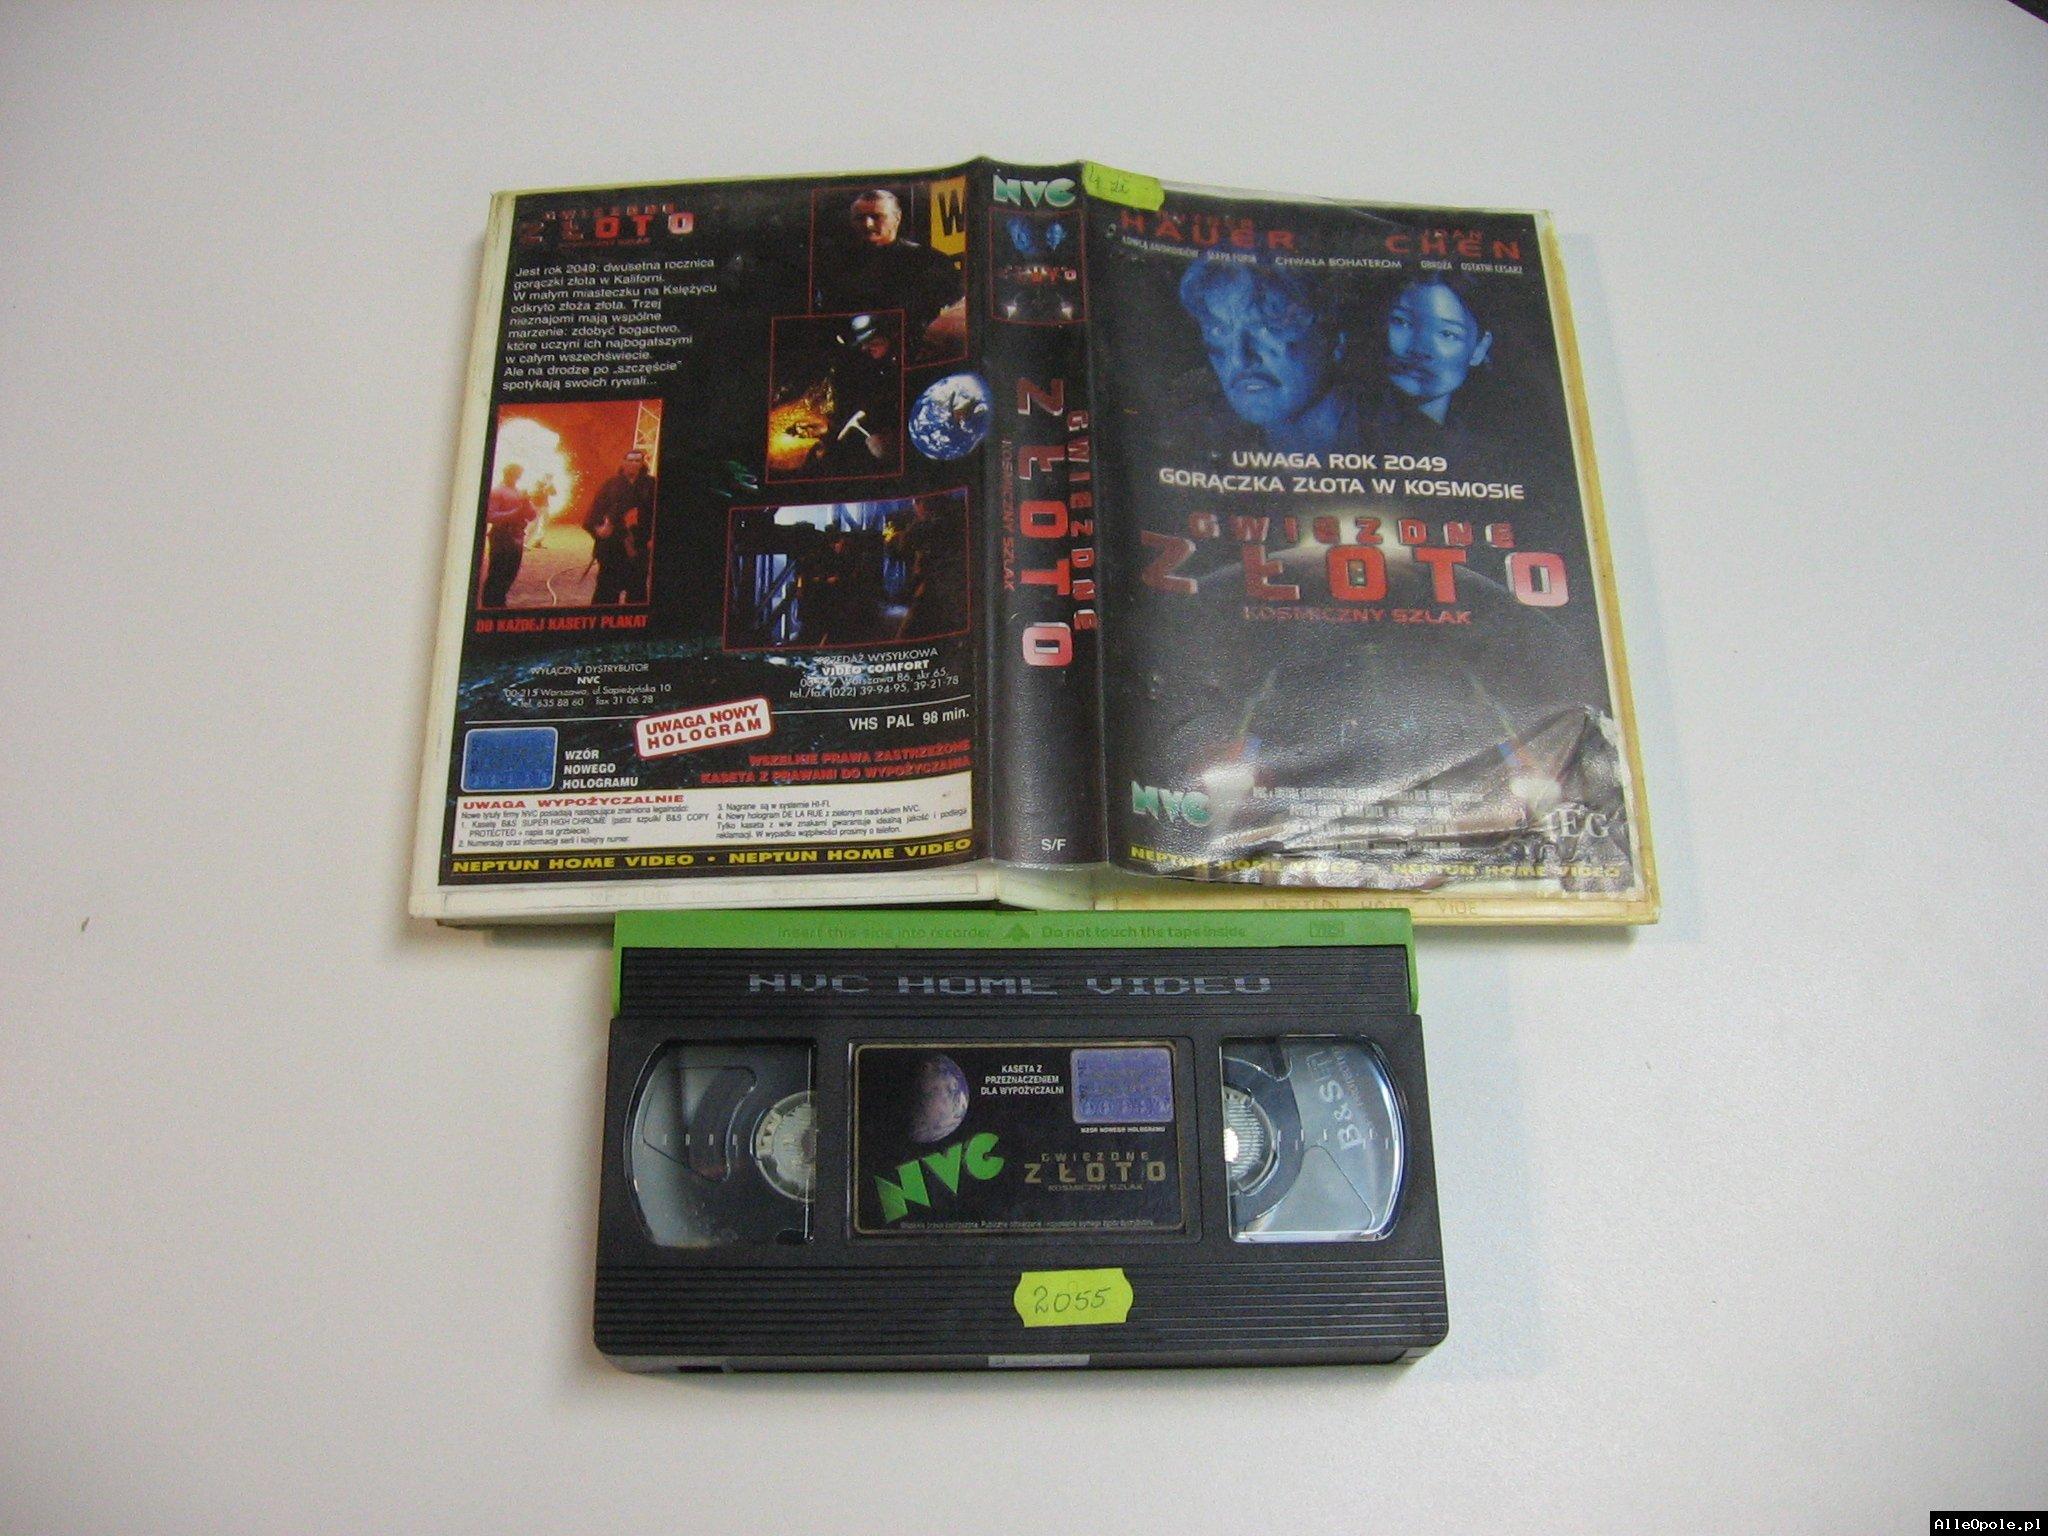 GWIEZDNE ZŁOTO - VHS Kaseta Video - Opole 1810